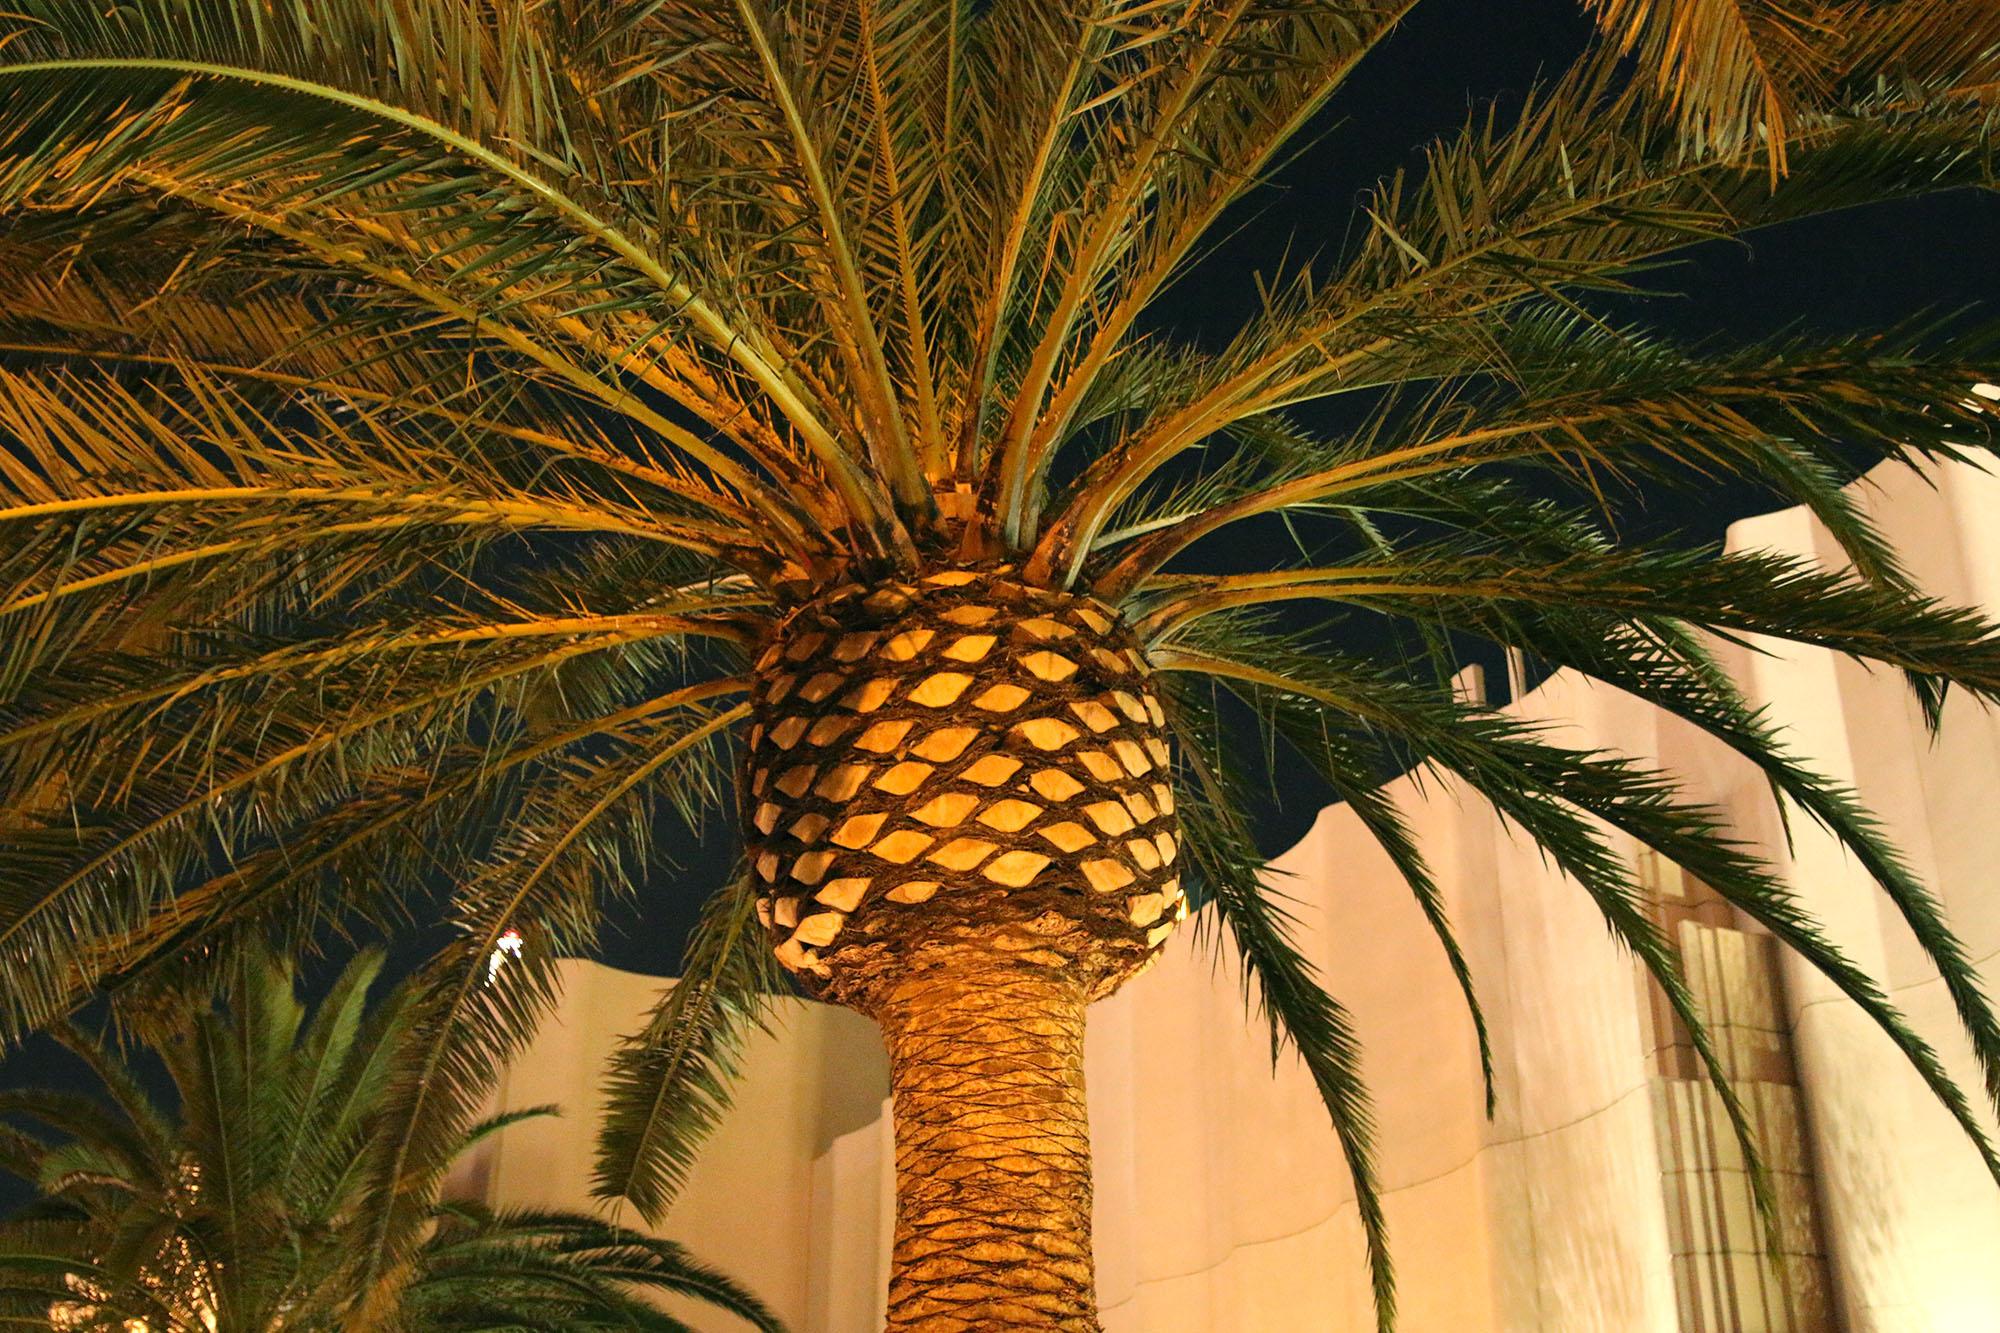 IMG_2149 las vegas palm x